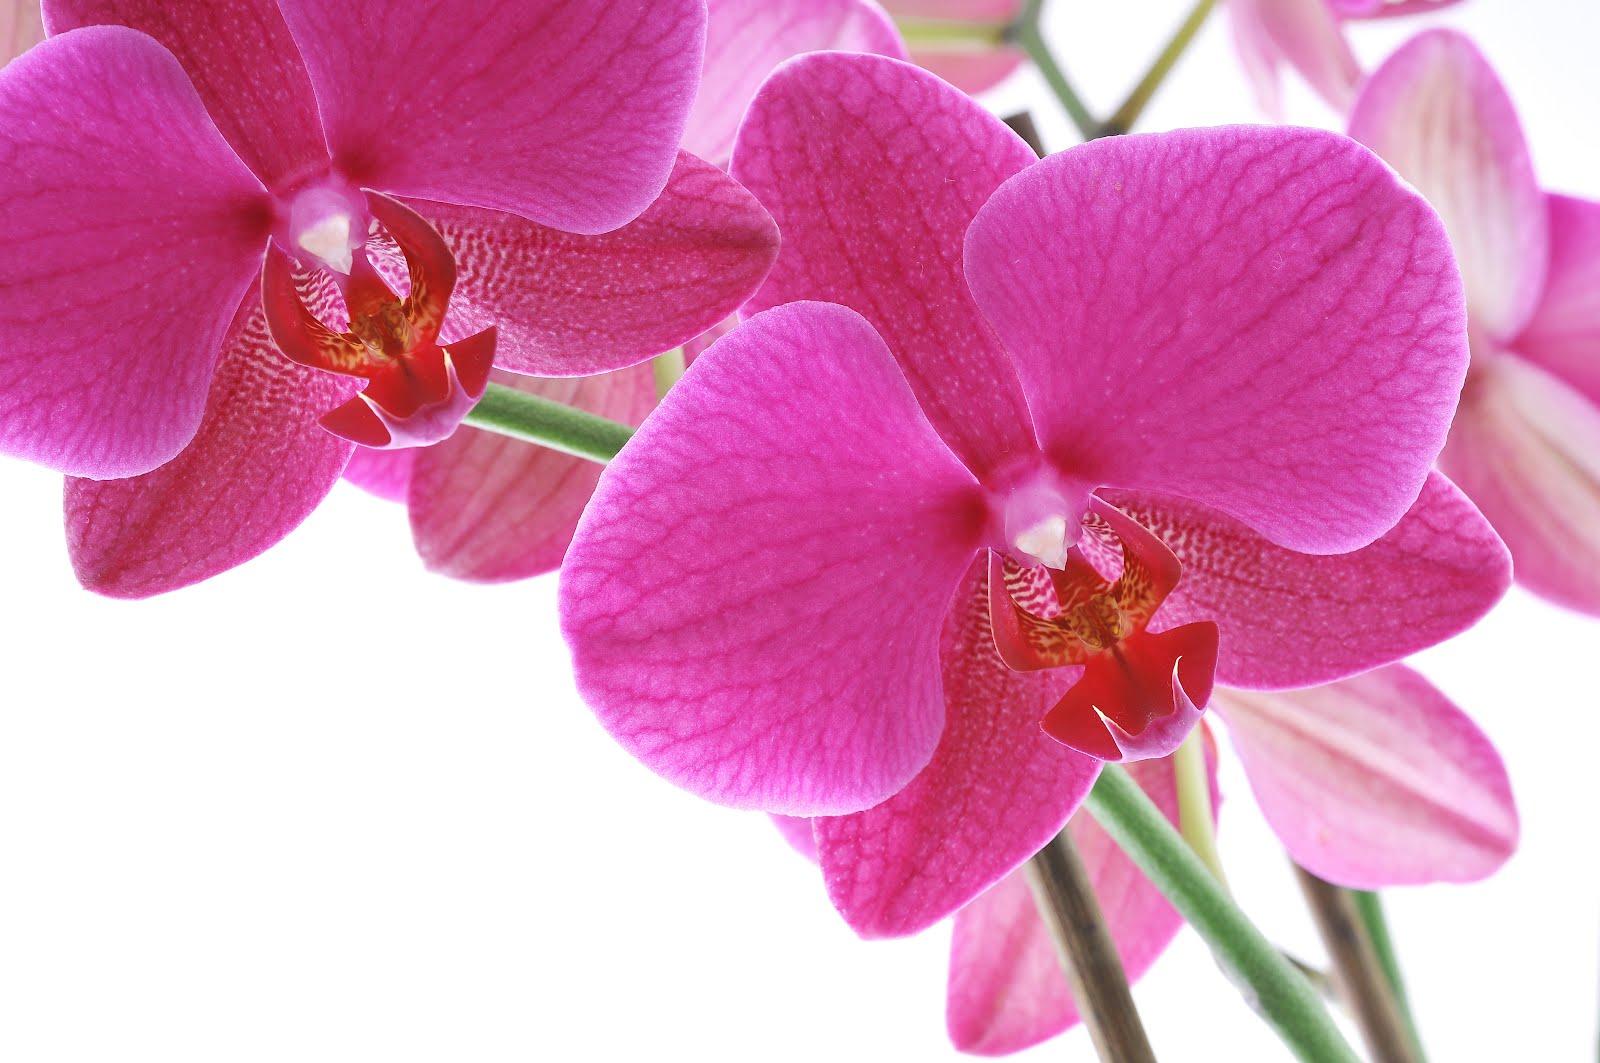 Esplendores de la naturaleza: Orquideas Descargar Gratis - Fotos Flores Orquideas Gratis